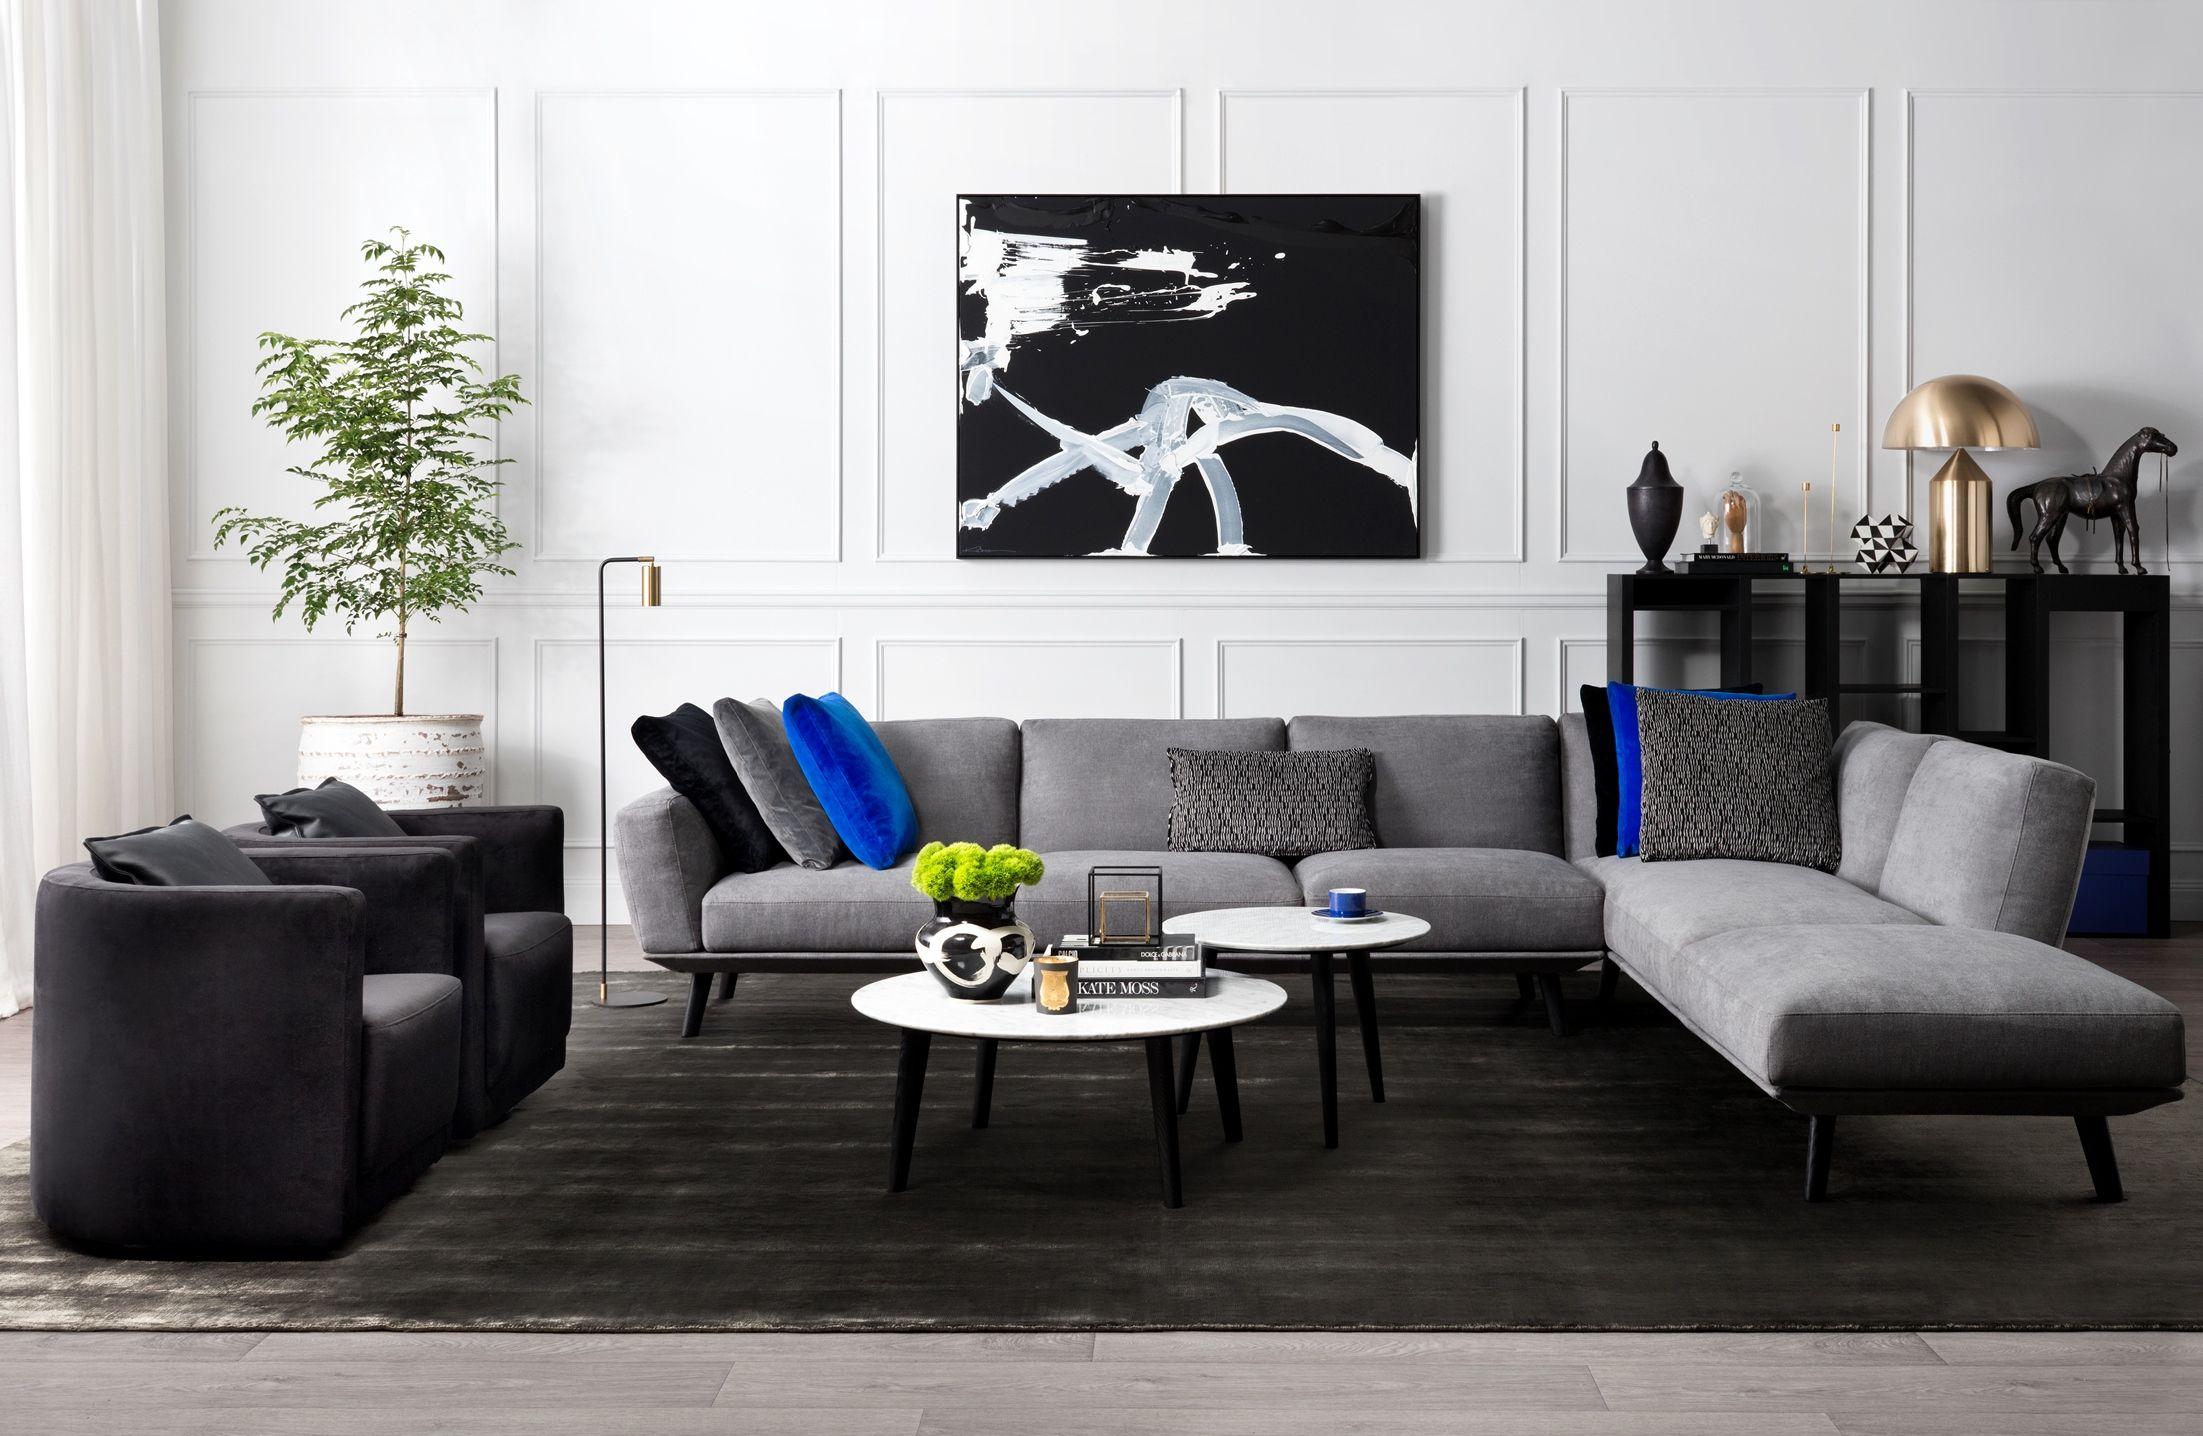 Top Ergebnis 50 Elegant sofa line Bestellen Galerie 2018 Zzt4 2017